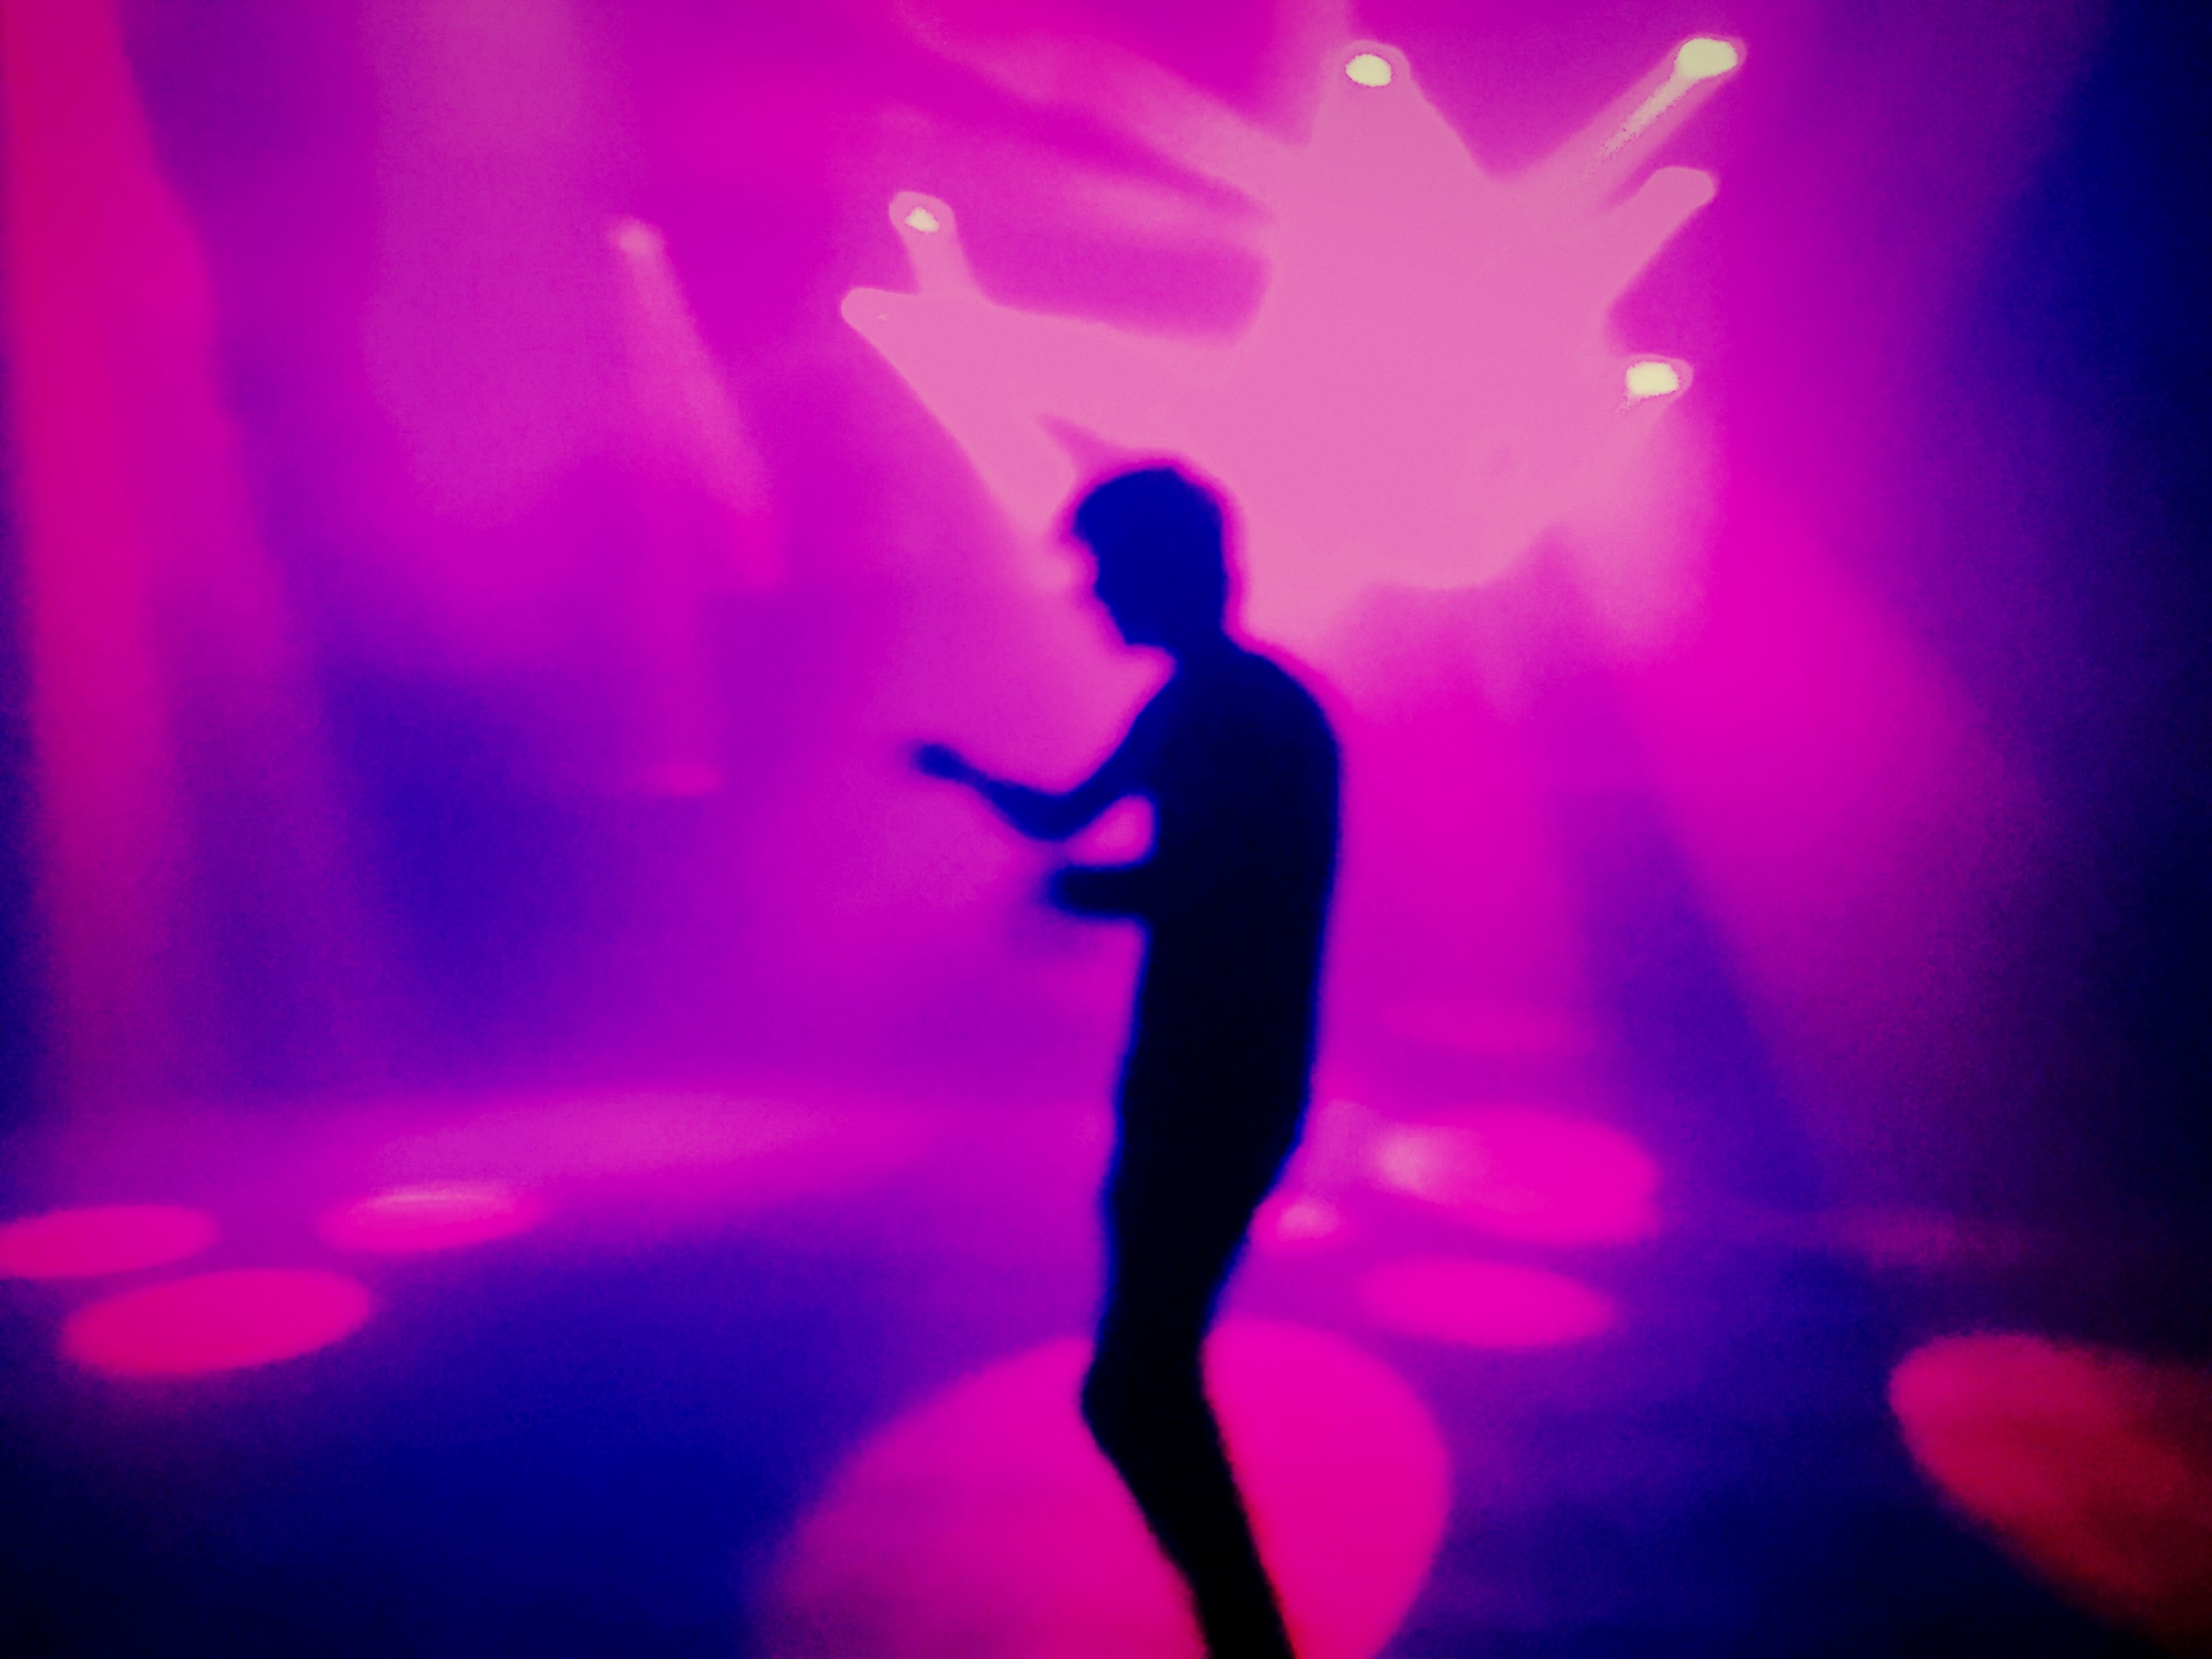 lifestyles, leisure activity, indoors, illuminated, silhouette, enjoyment, arts culture and entertainment, men, night, person, fun, music, light - natural phenomenon, nightlife, performance, togetherness, nightclub